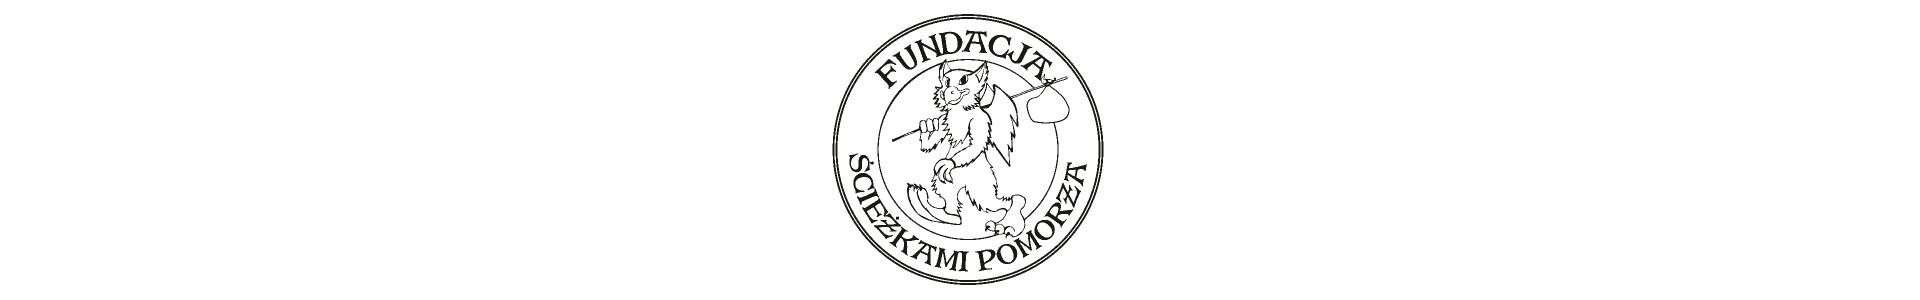 banner_sciezkami-pomorza